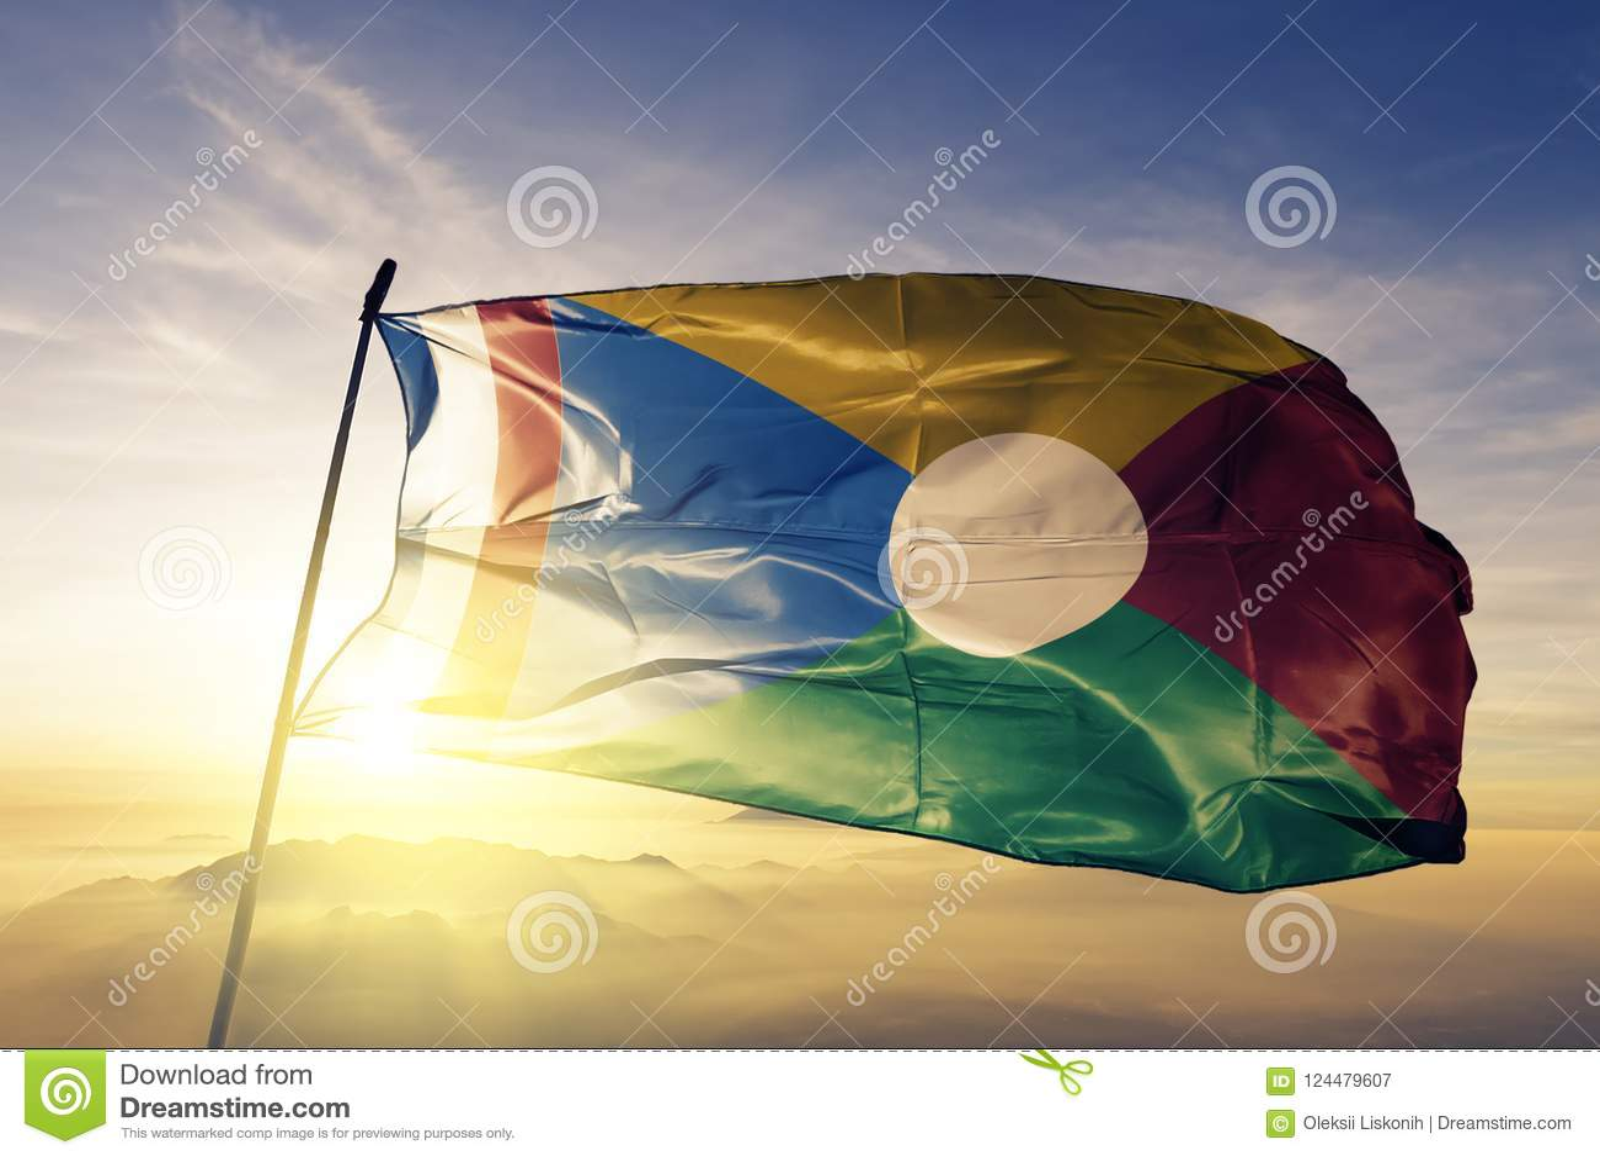 Tissu De La Reunion tissu de tissu de textile de drapeau national de la réunion